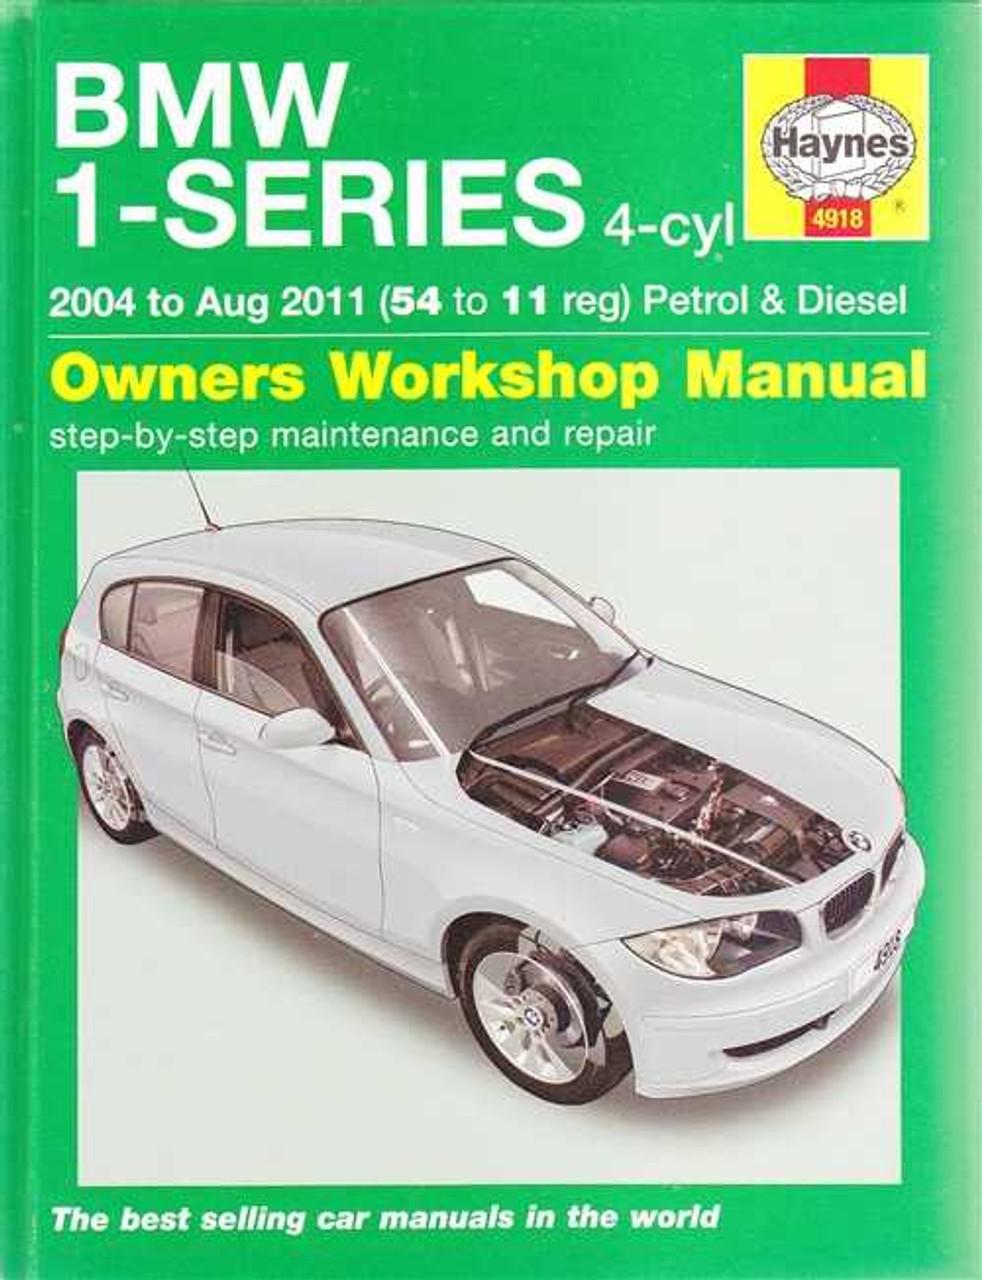 bmw 120i ownerns manual free owners manual u2022 rh wordworksbysea com BMW 2011 135 Owner's Manual 2011 bmw 135i convertible owners manual